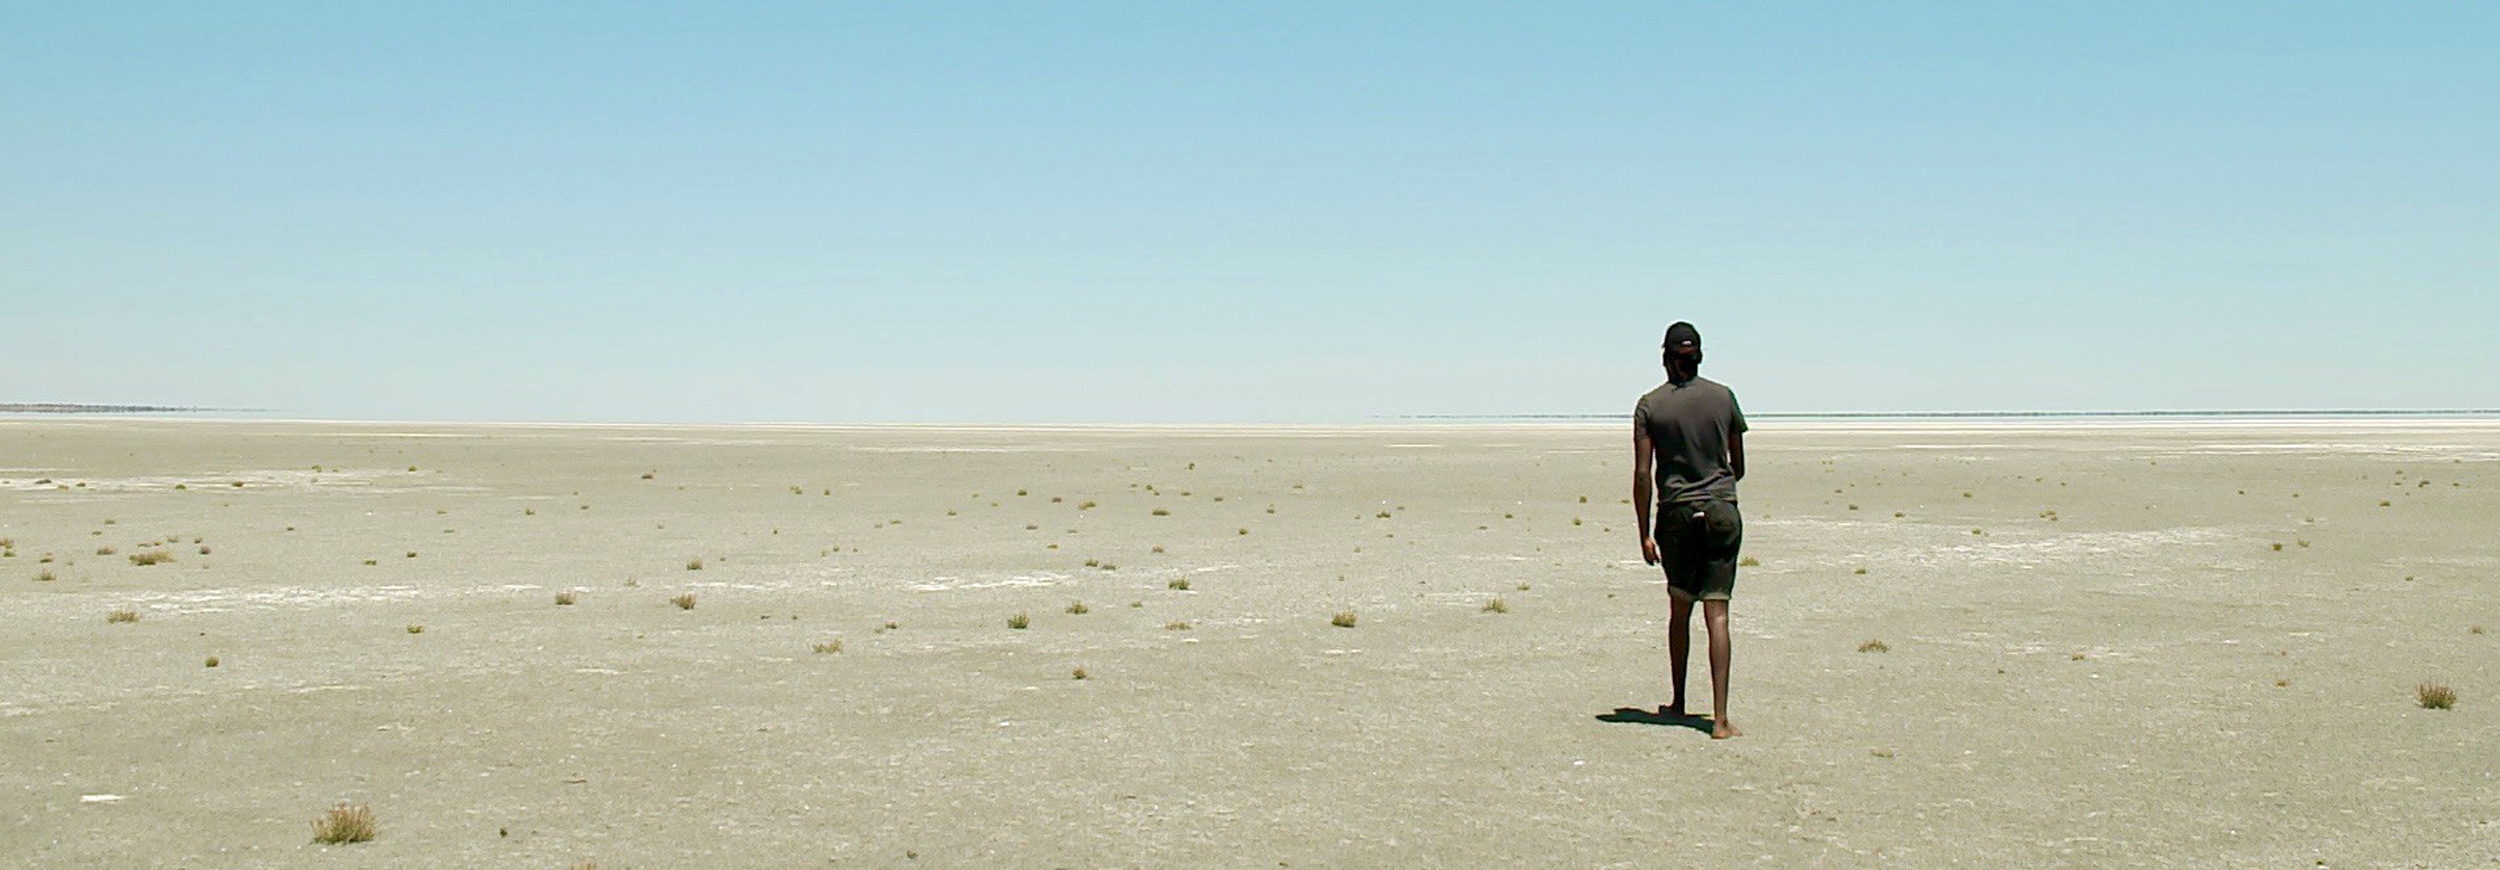 Image of man walking in remote community